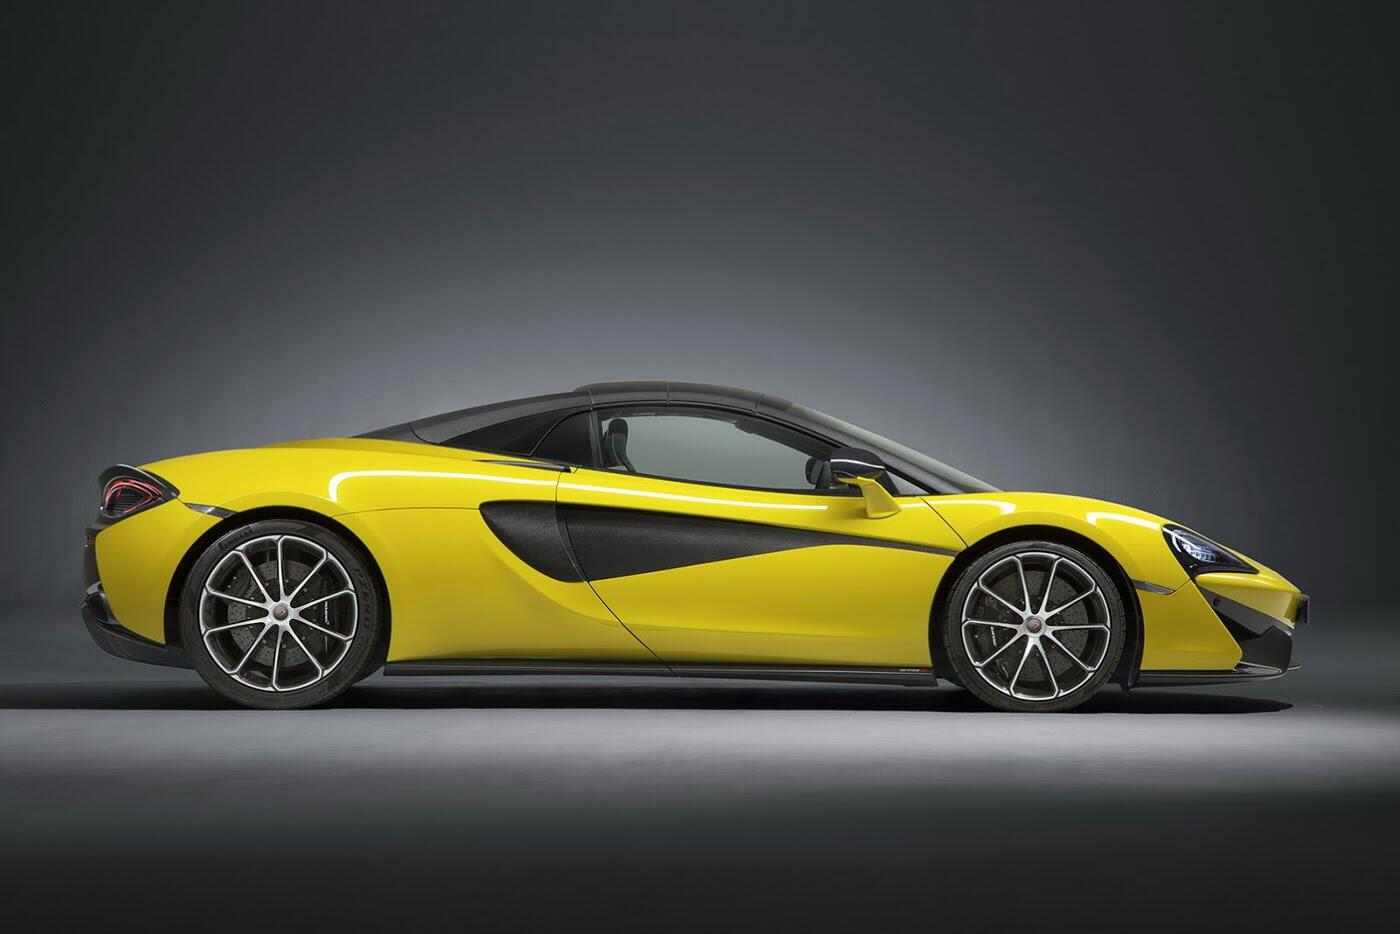 Siêu xe McLaren 570S Spider sắp ra mắt - Hình 9